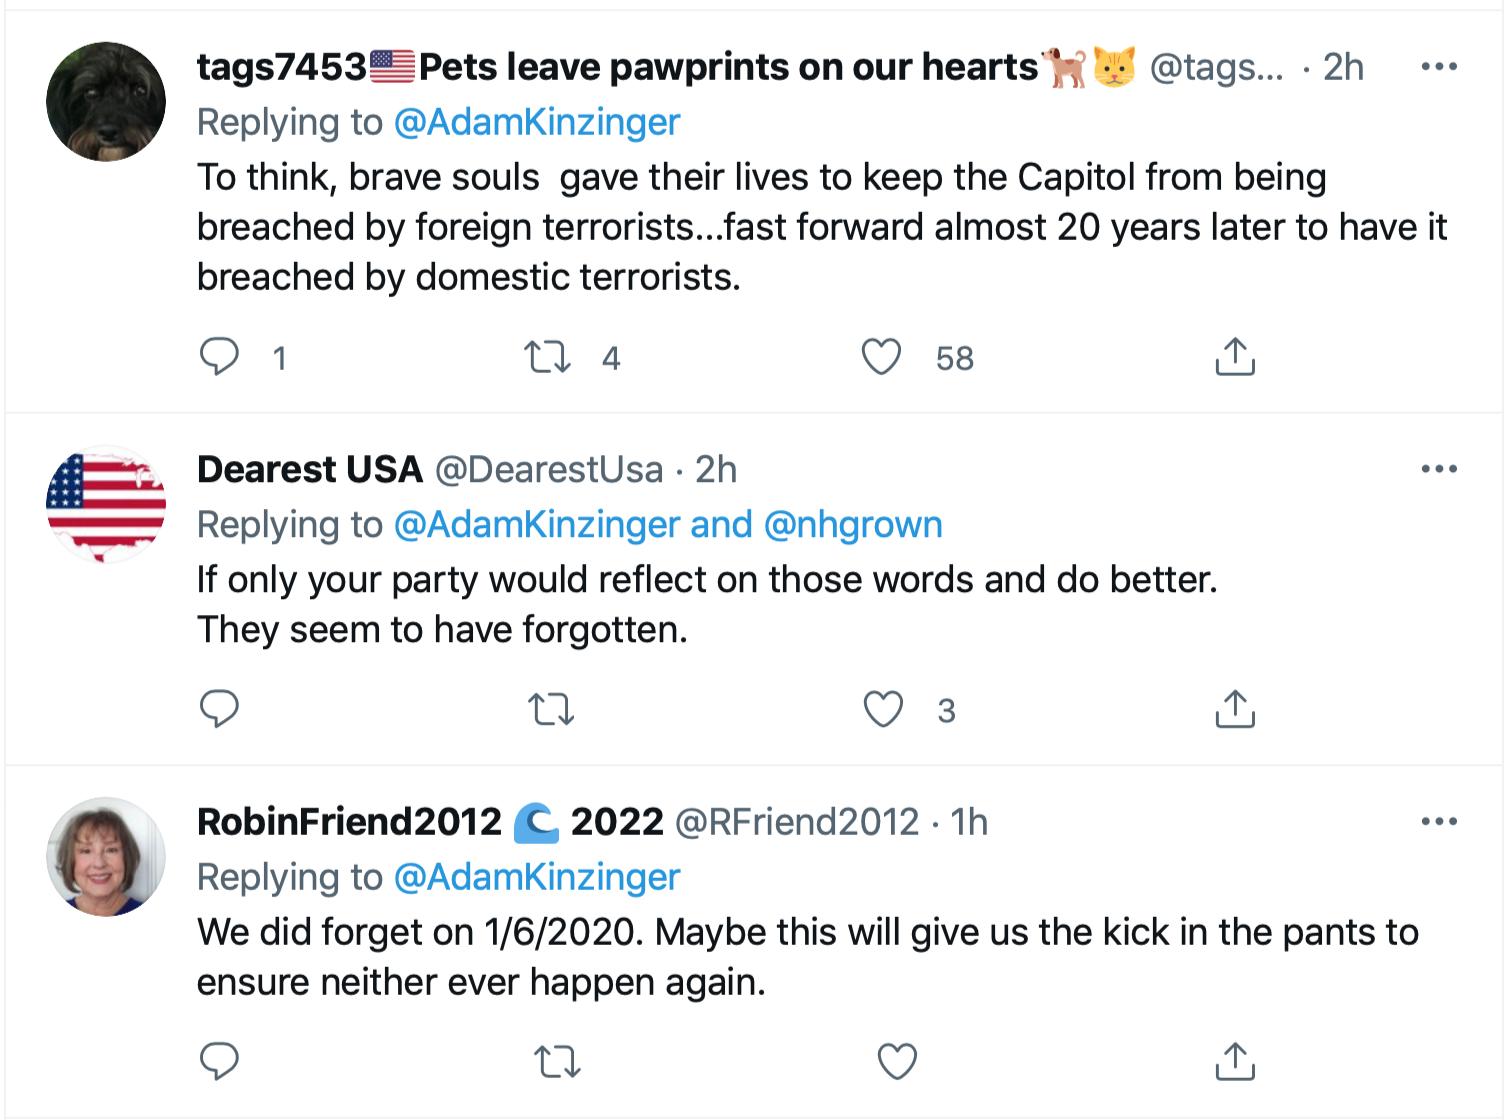 Screen-Shot-2021-09-11-at-1.49.08-PM Kinzinger Amplifies George Bush Comparison Of 9/11 To Insurrection Donald Trump Featured Investigation Politics Terrorism Twitter